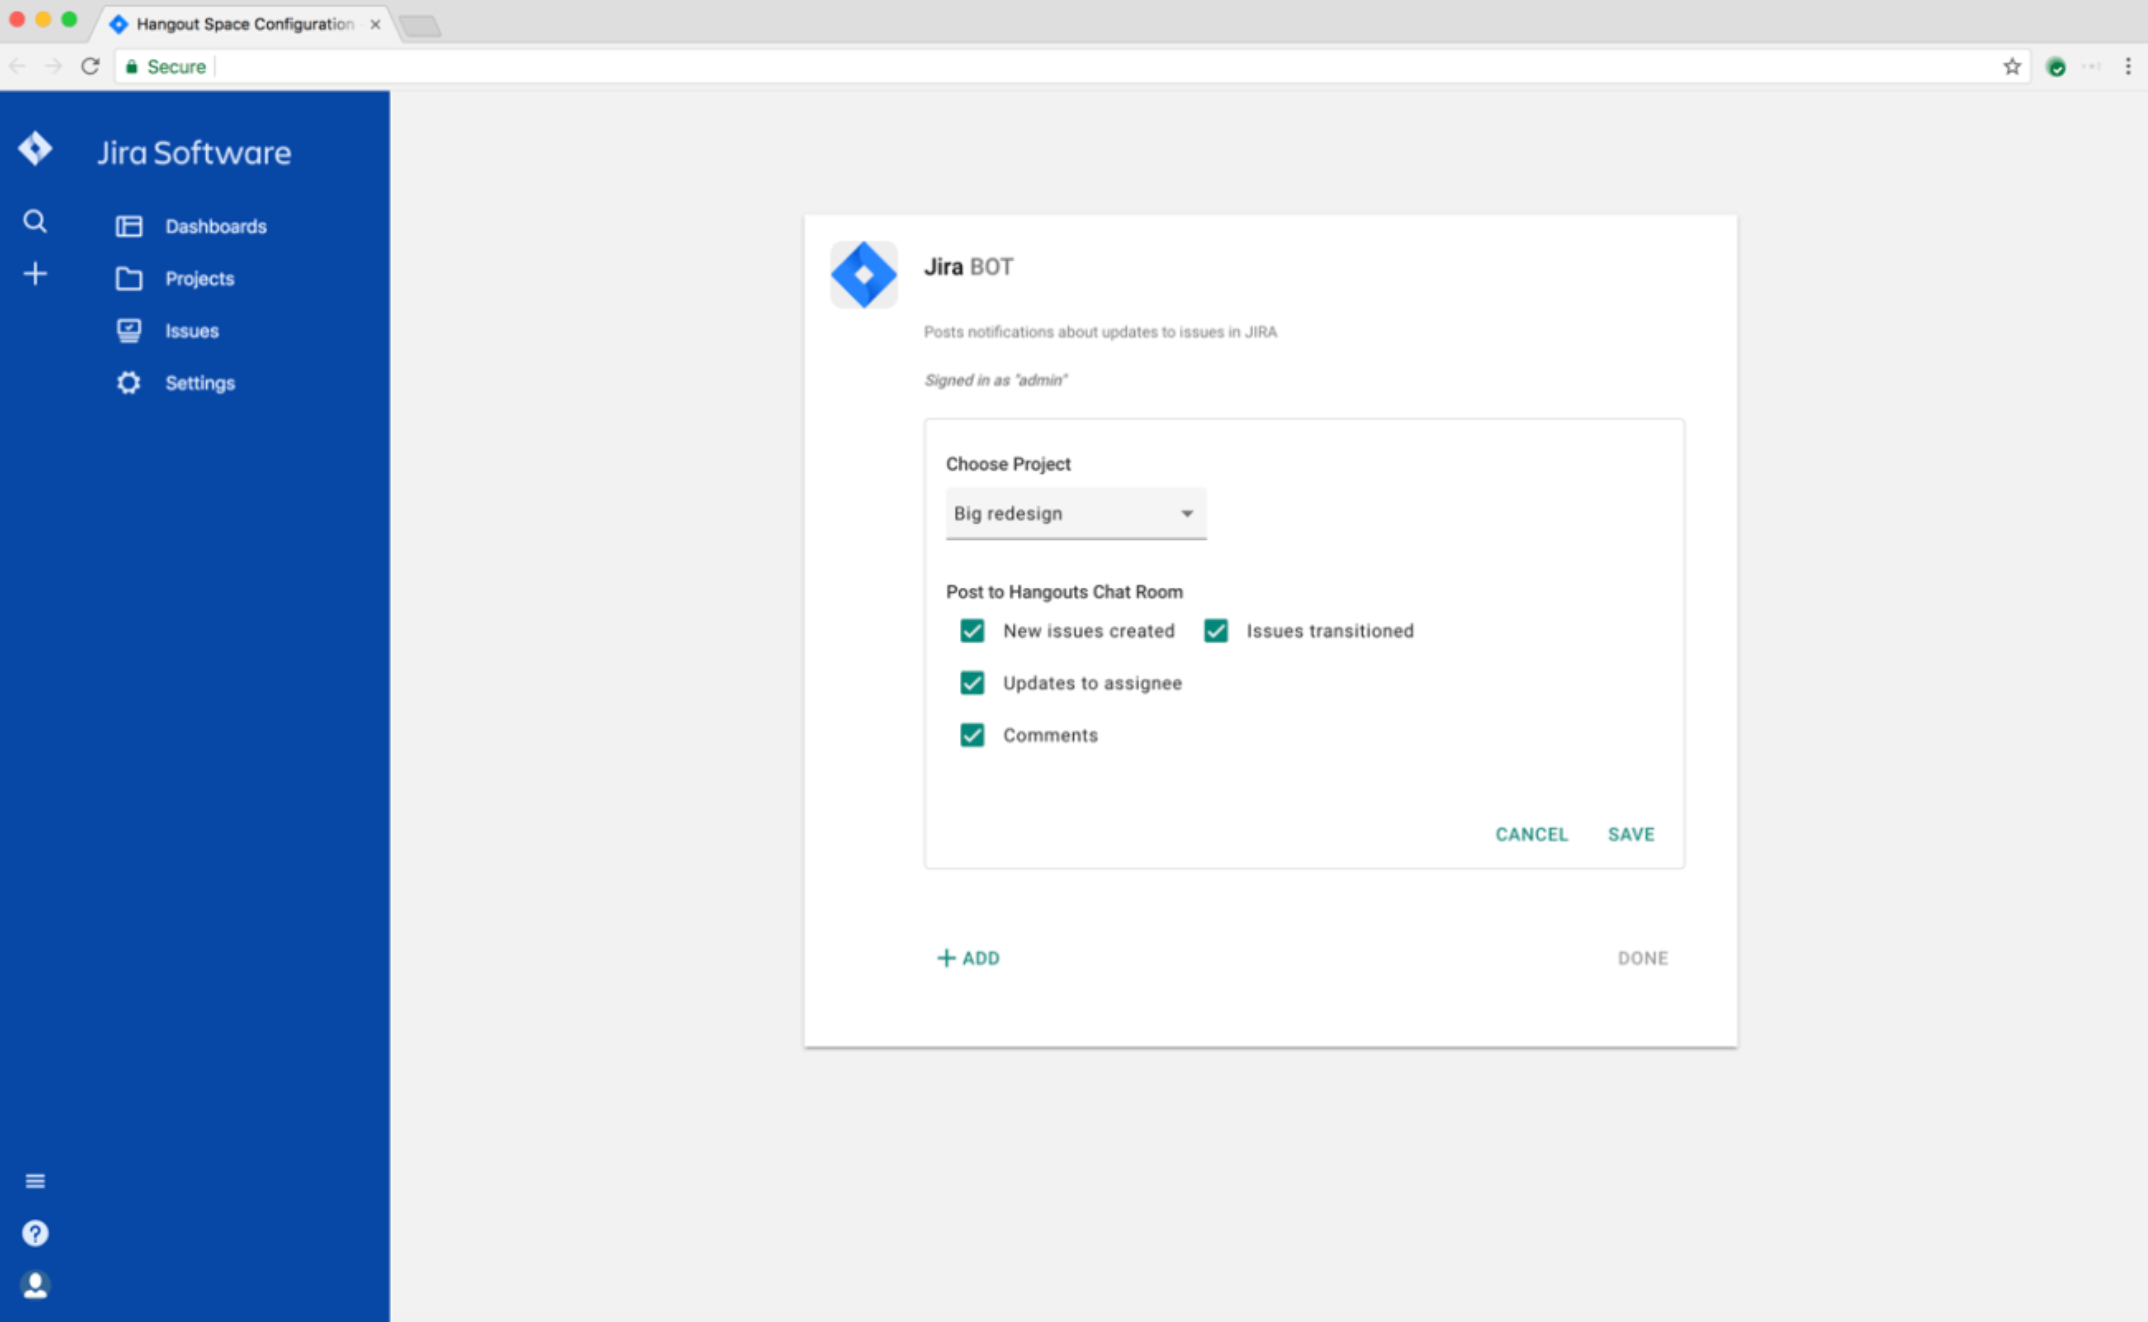 Jira Cloud für Hangouts Chat - Konfiguration